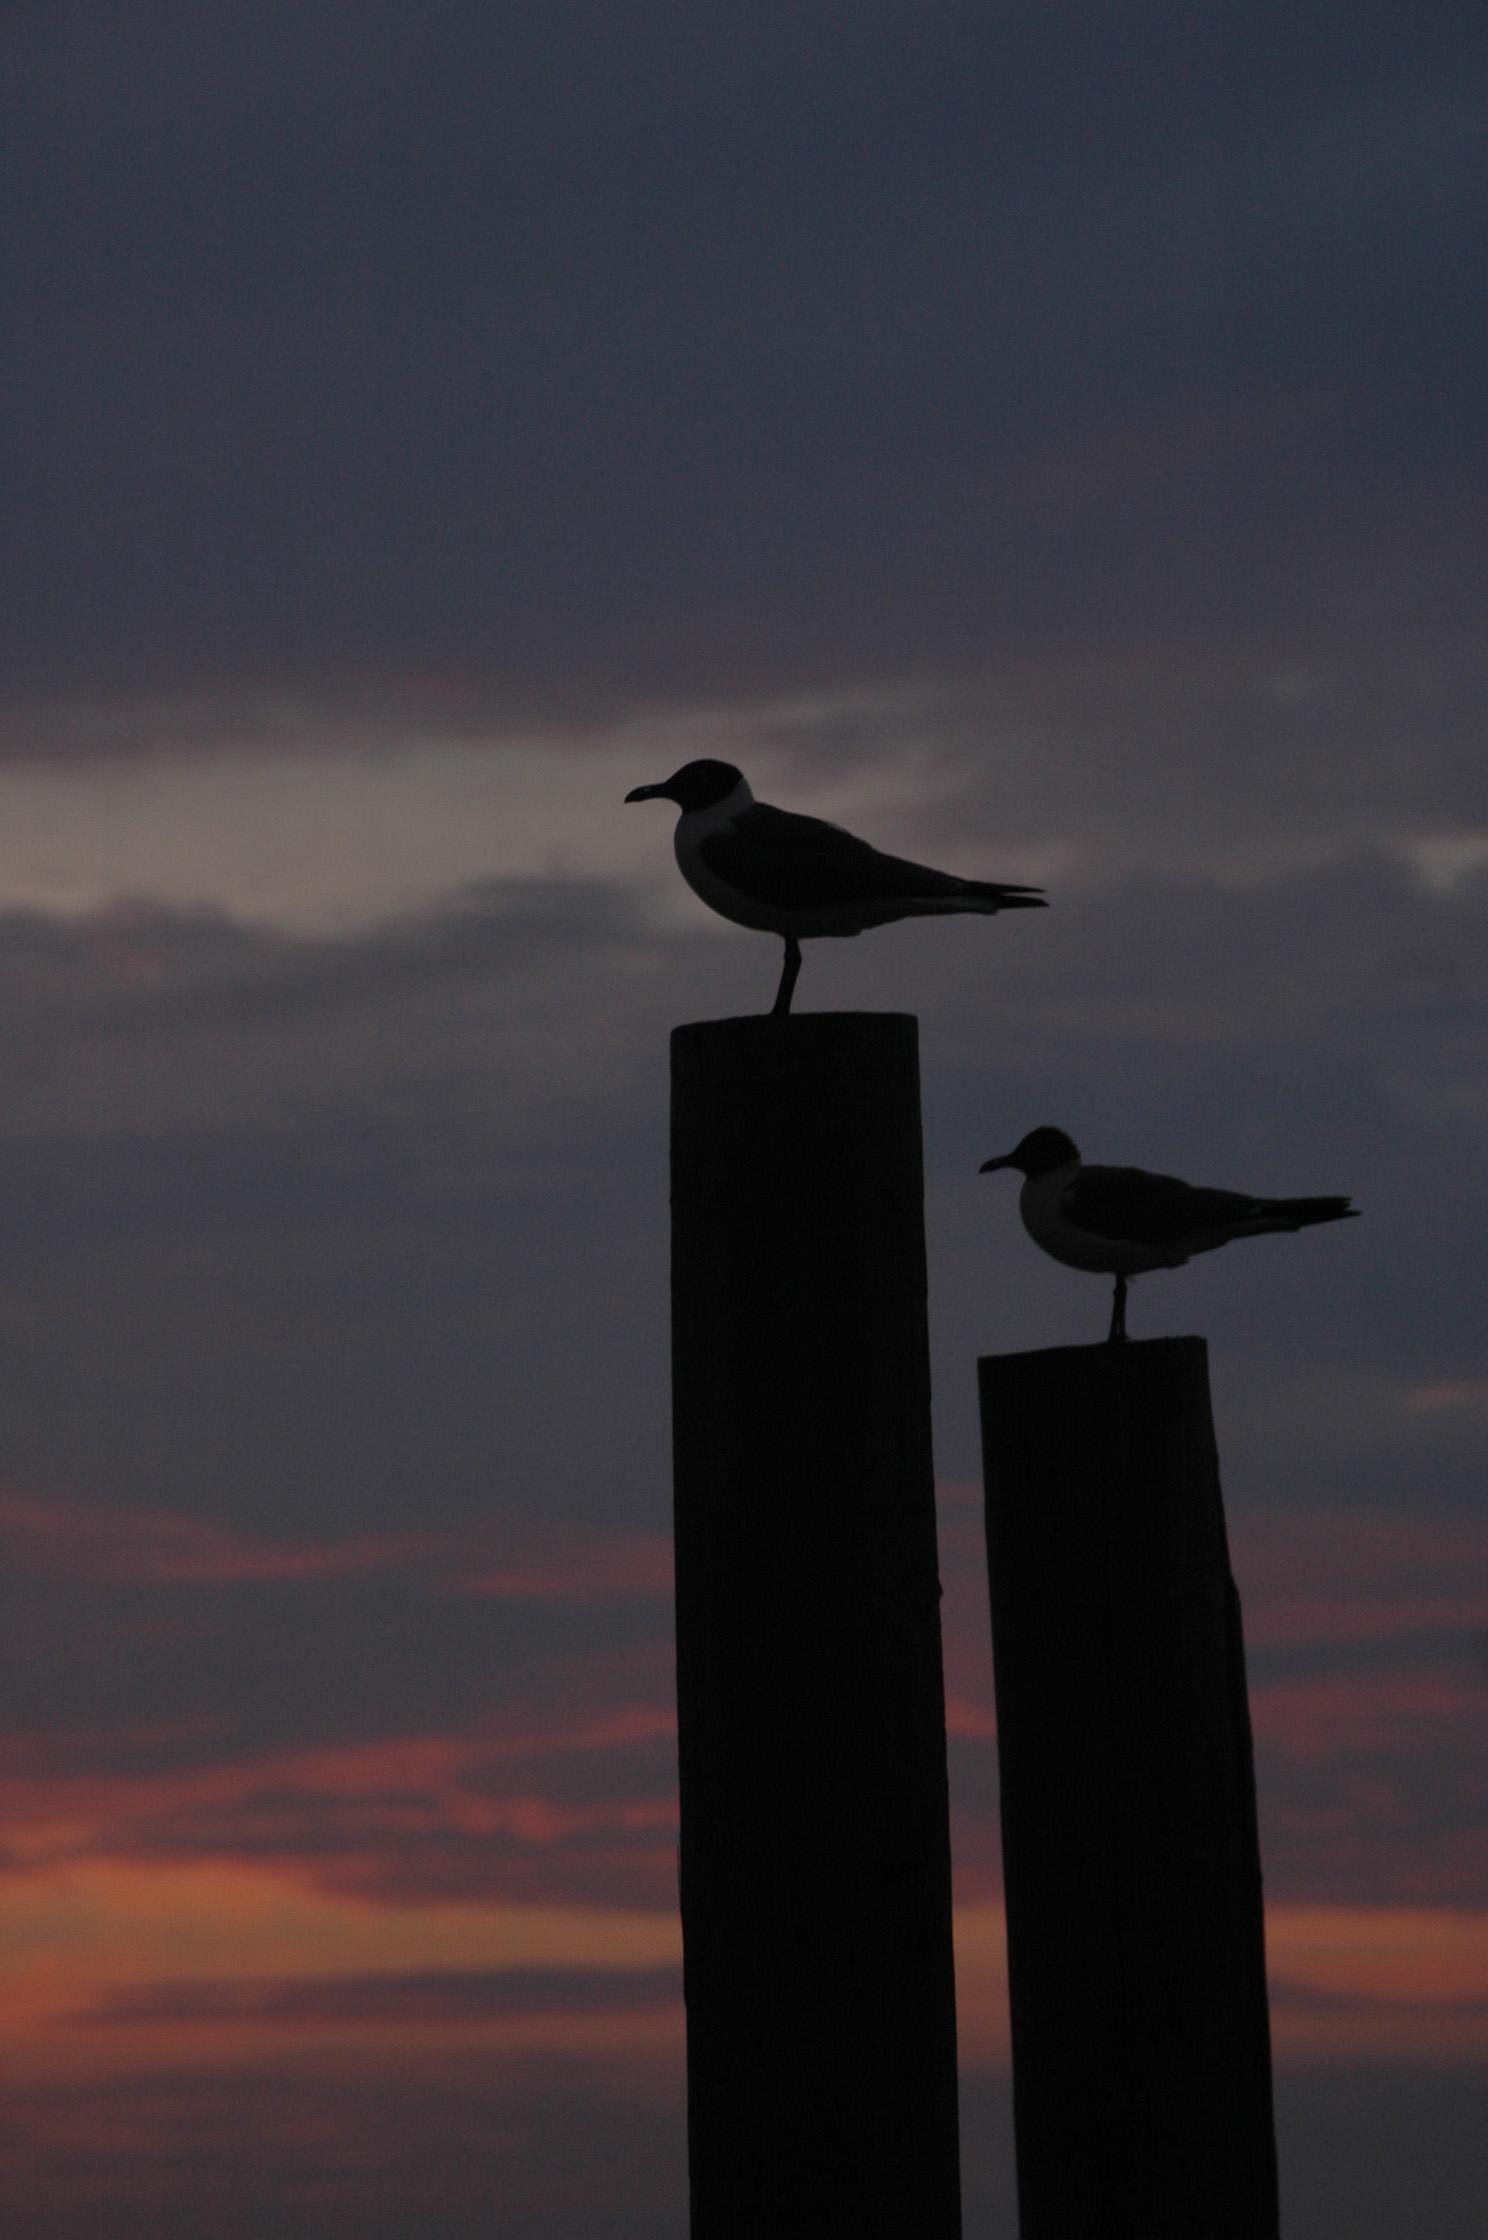 twilight seagulls